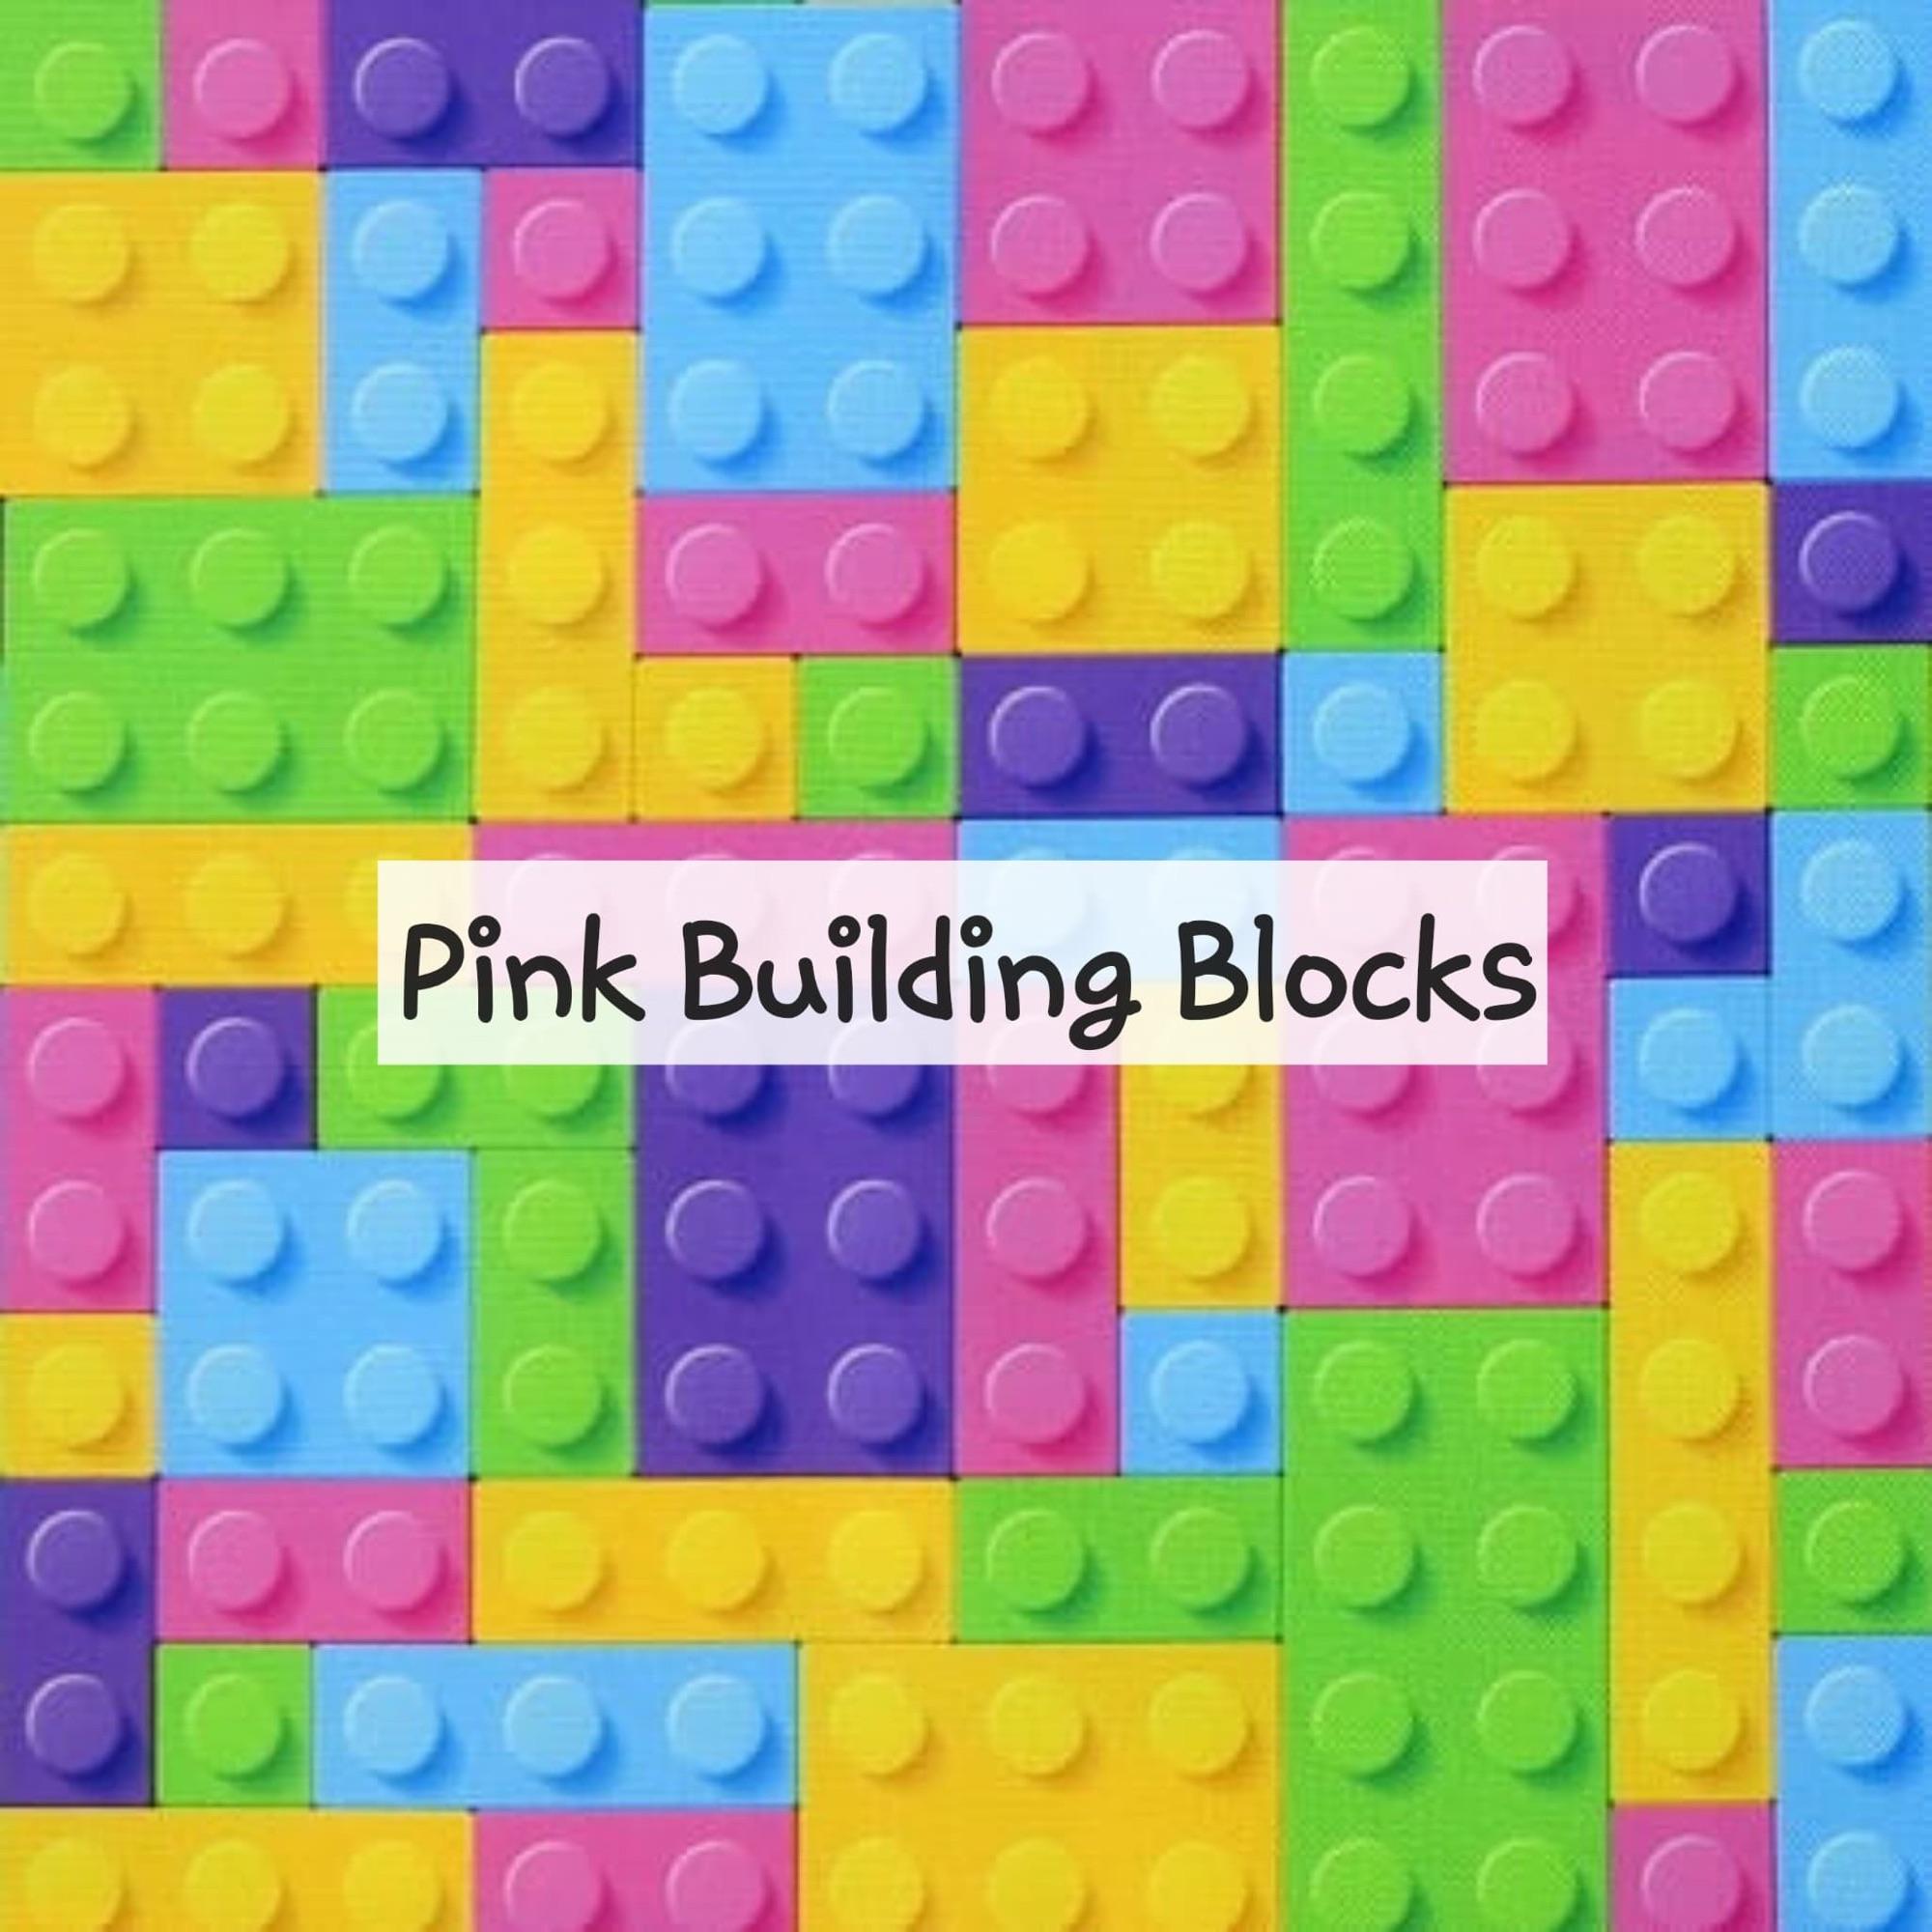 Pink Building Blocks